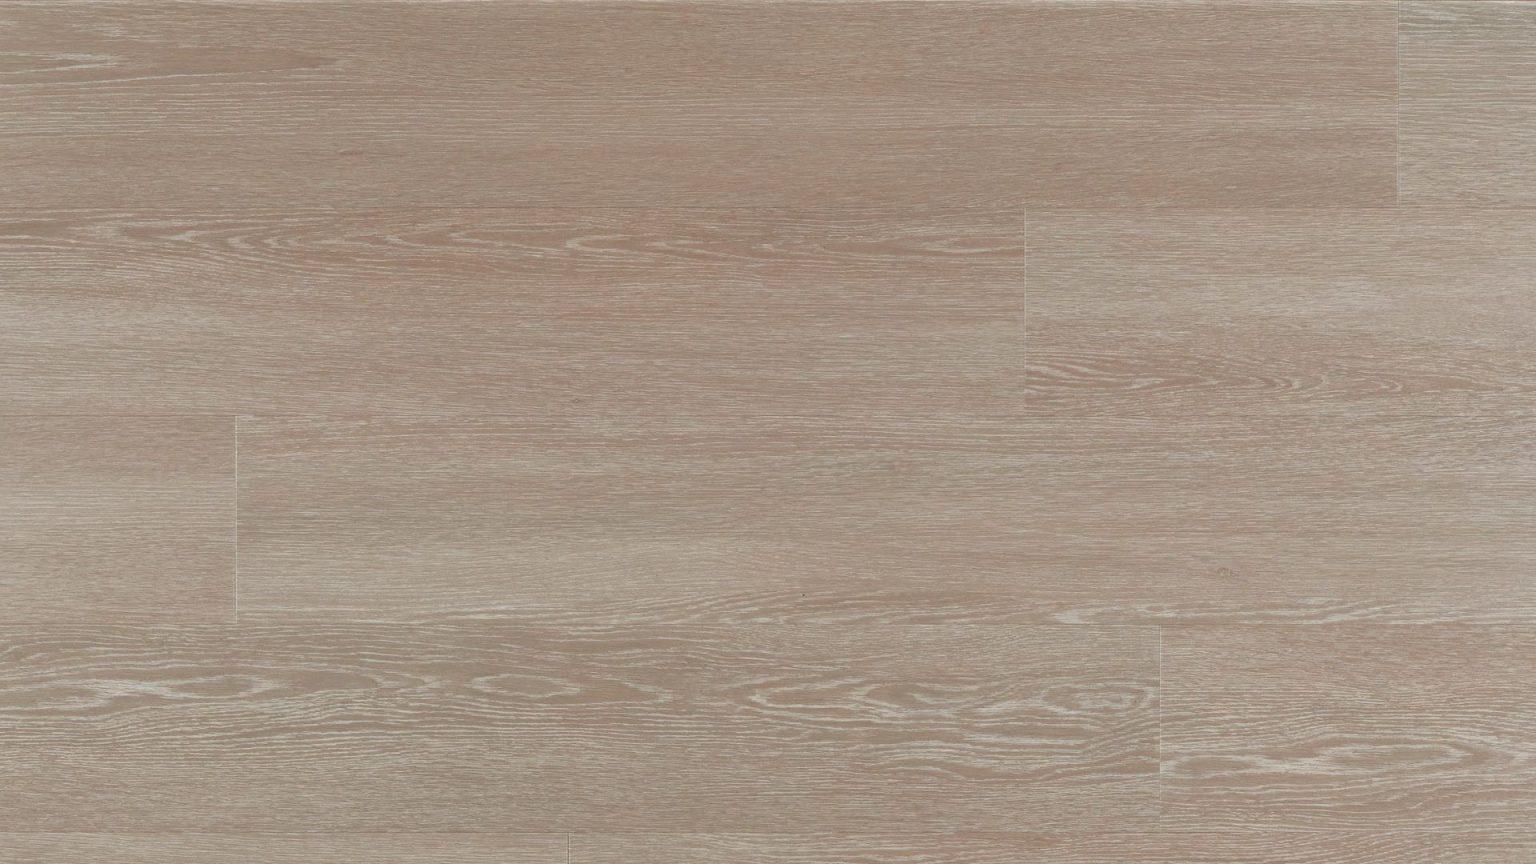 Québec 50 LVRE 134 / COREtec® authentics wood